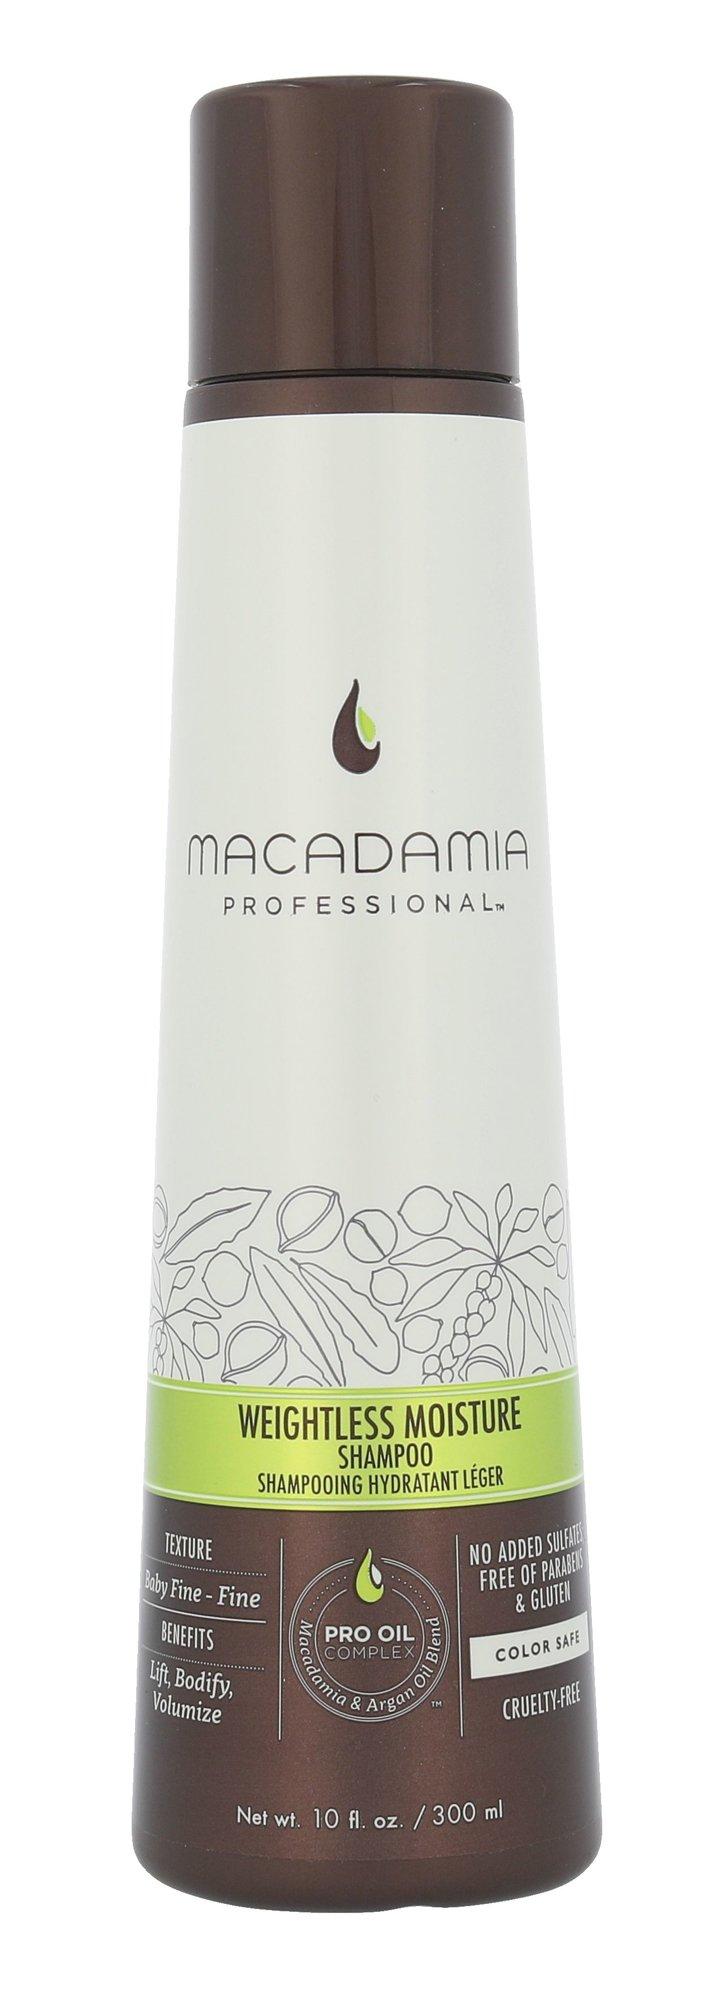 Macadamia Weightless Moisture Shampoo Cosmetic 300ml